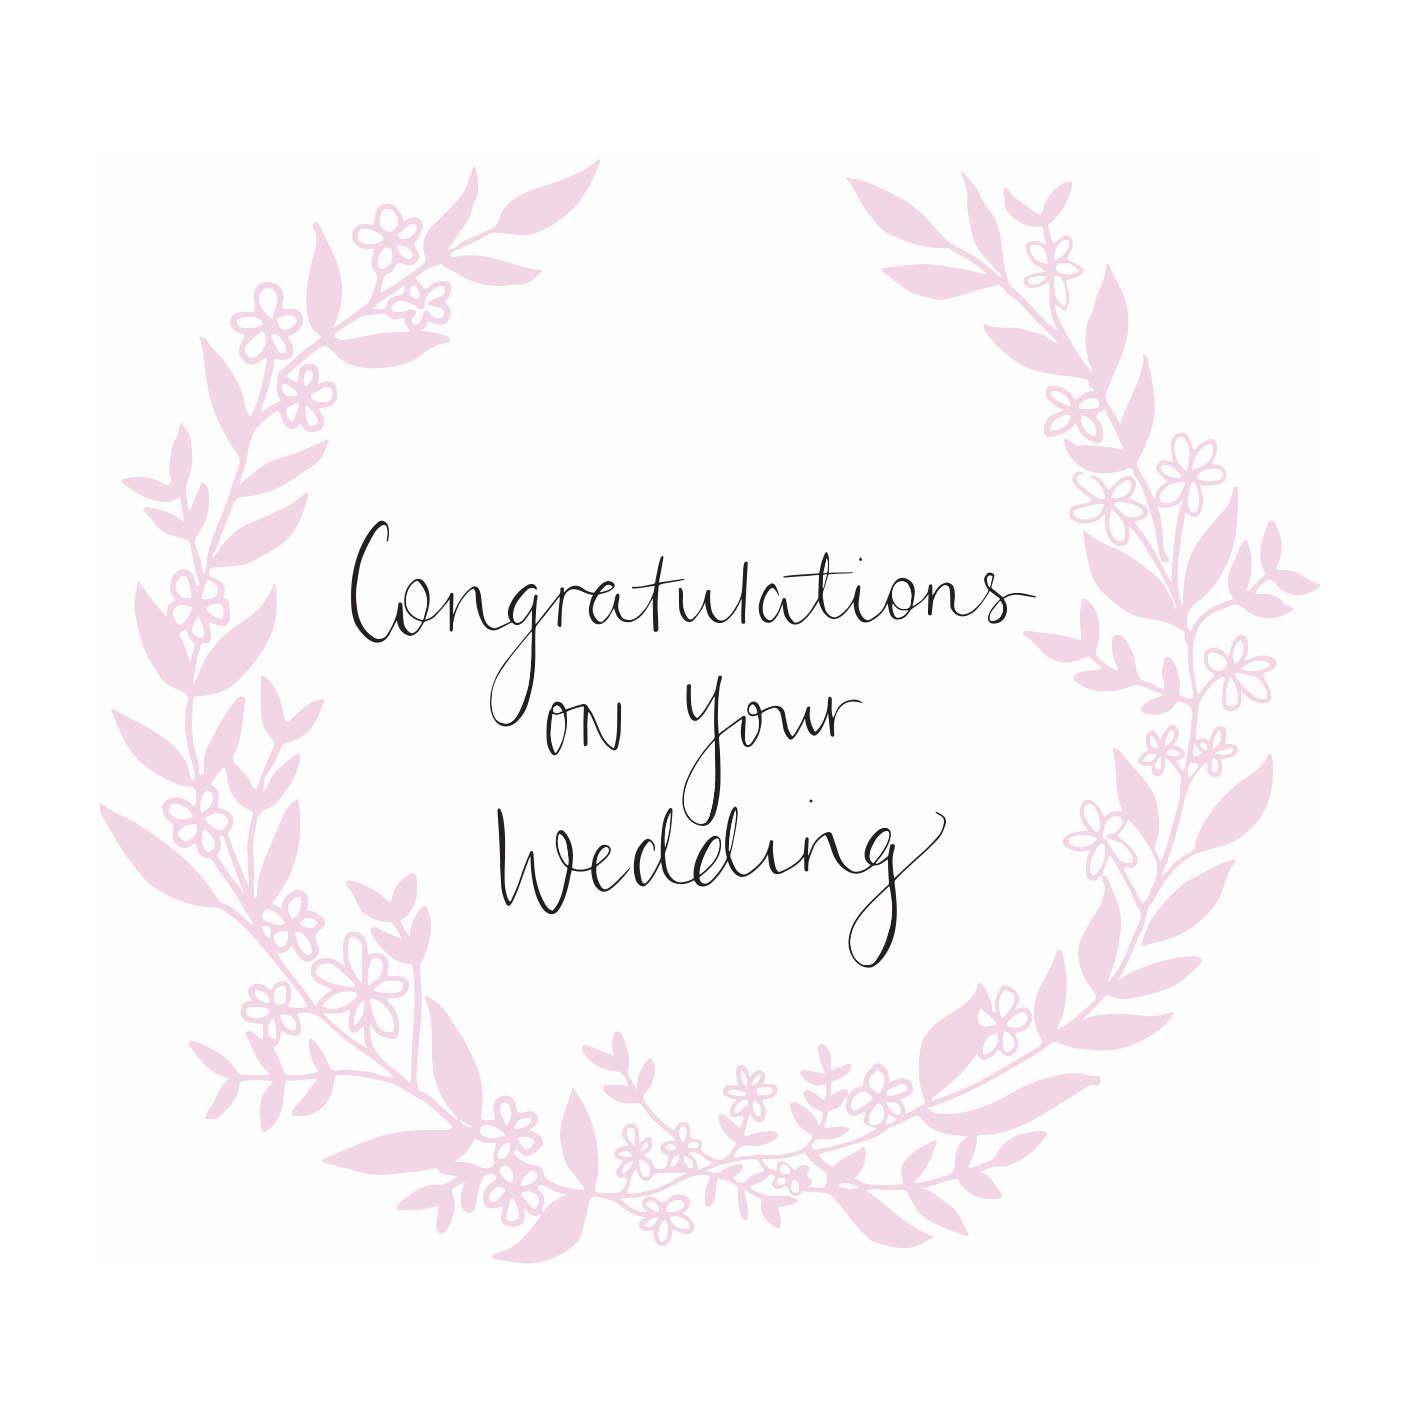 Congratulations Wedding Anniversary Cards Kpr Designs